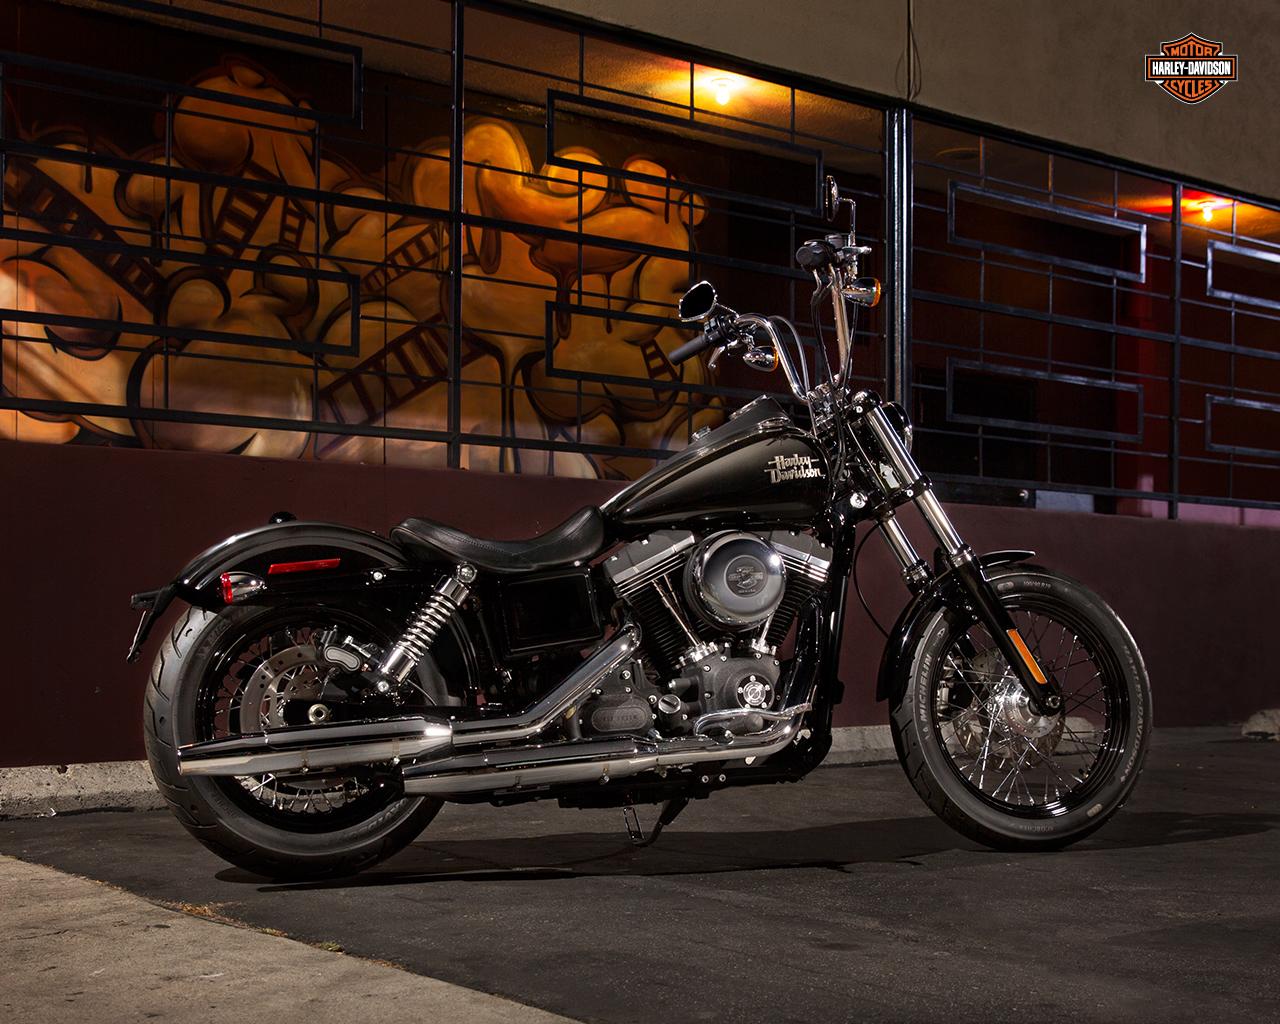 Harley Davidson Street Bob Wallpaper - WallpaperSafari